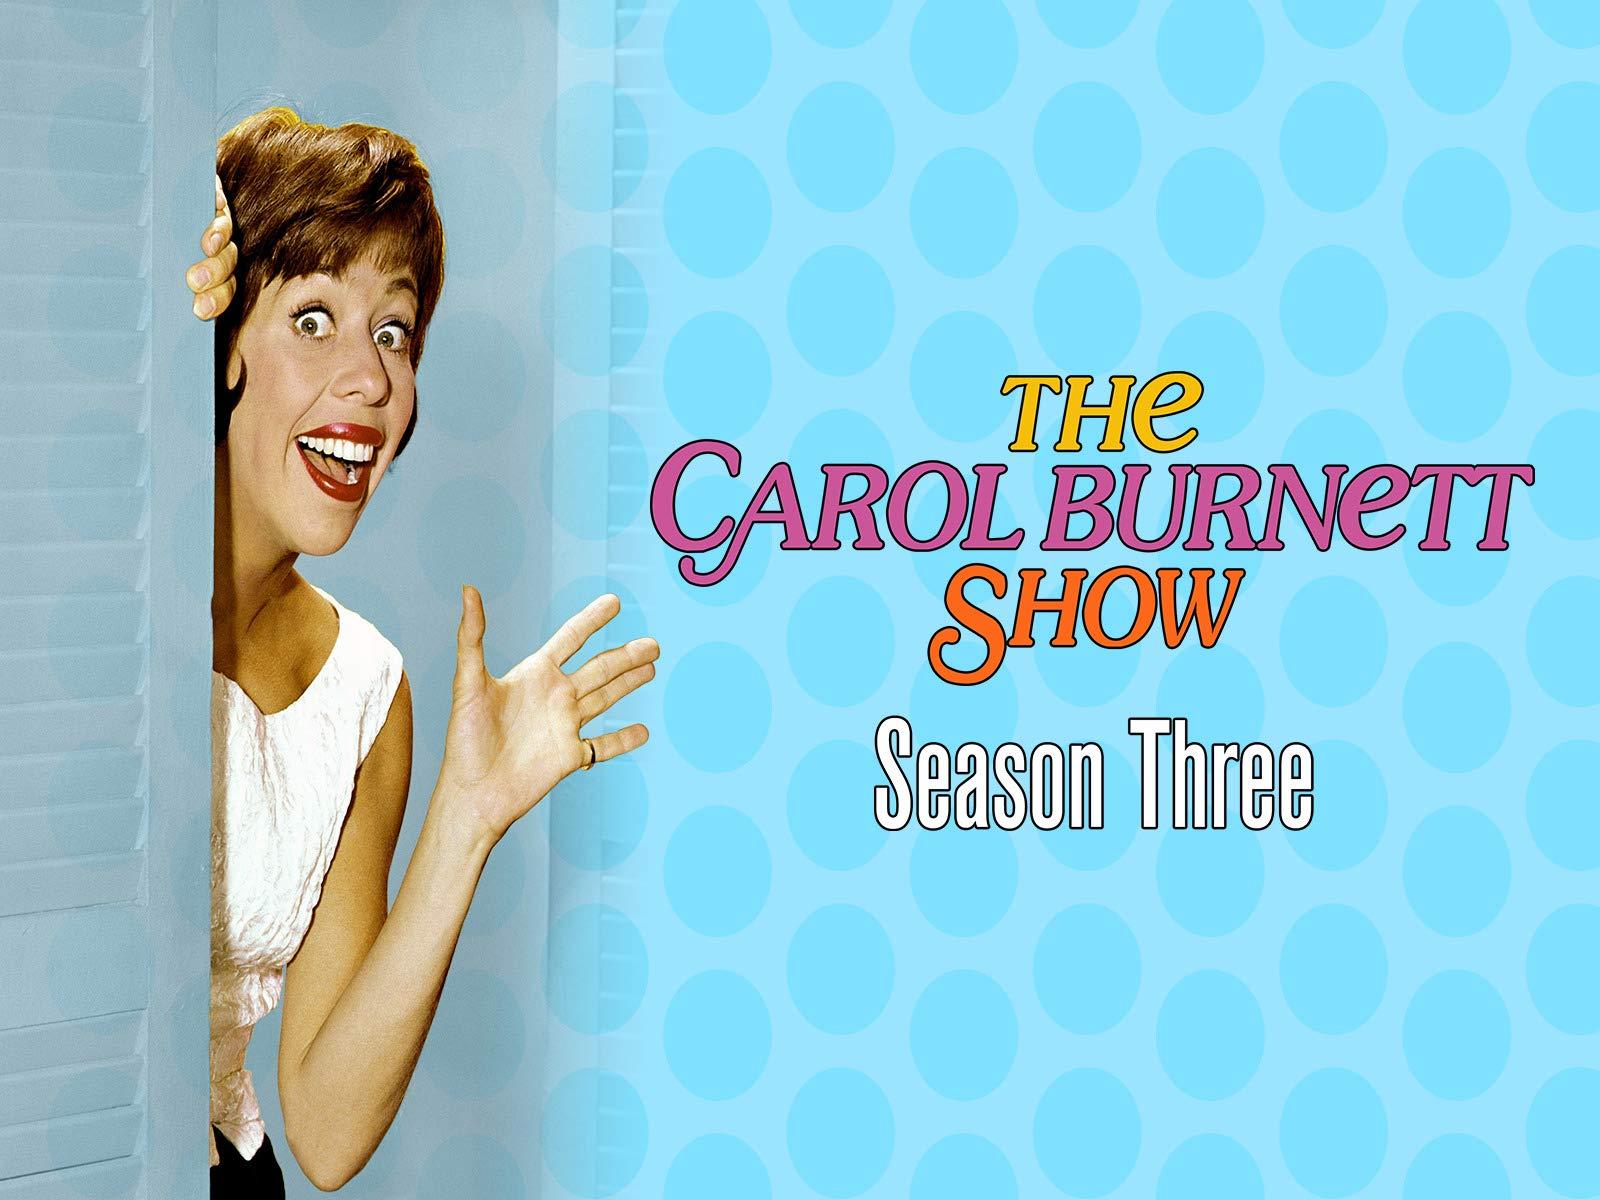 The Carol Burnett Show - Season 3